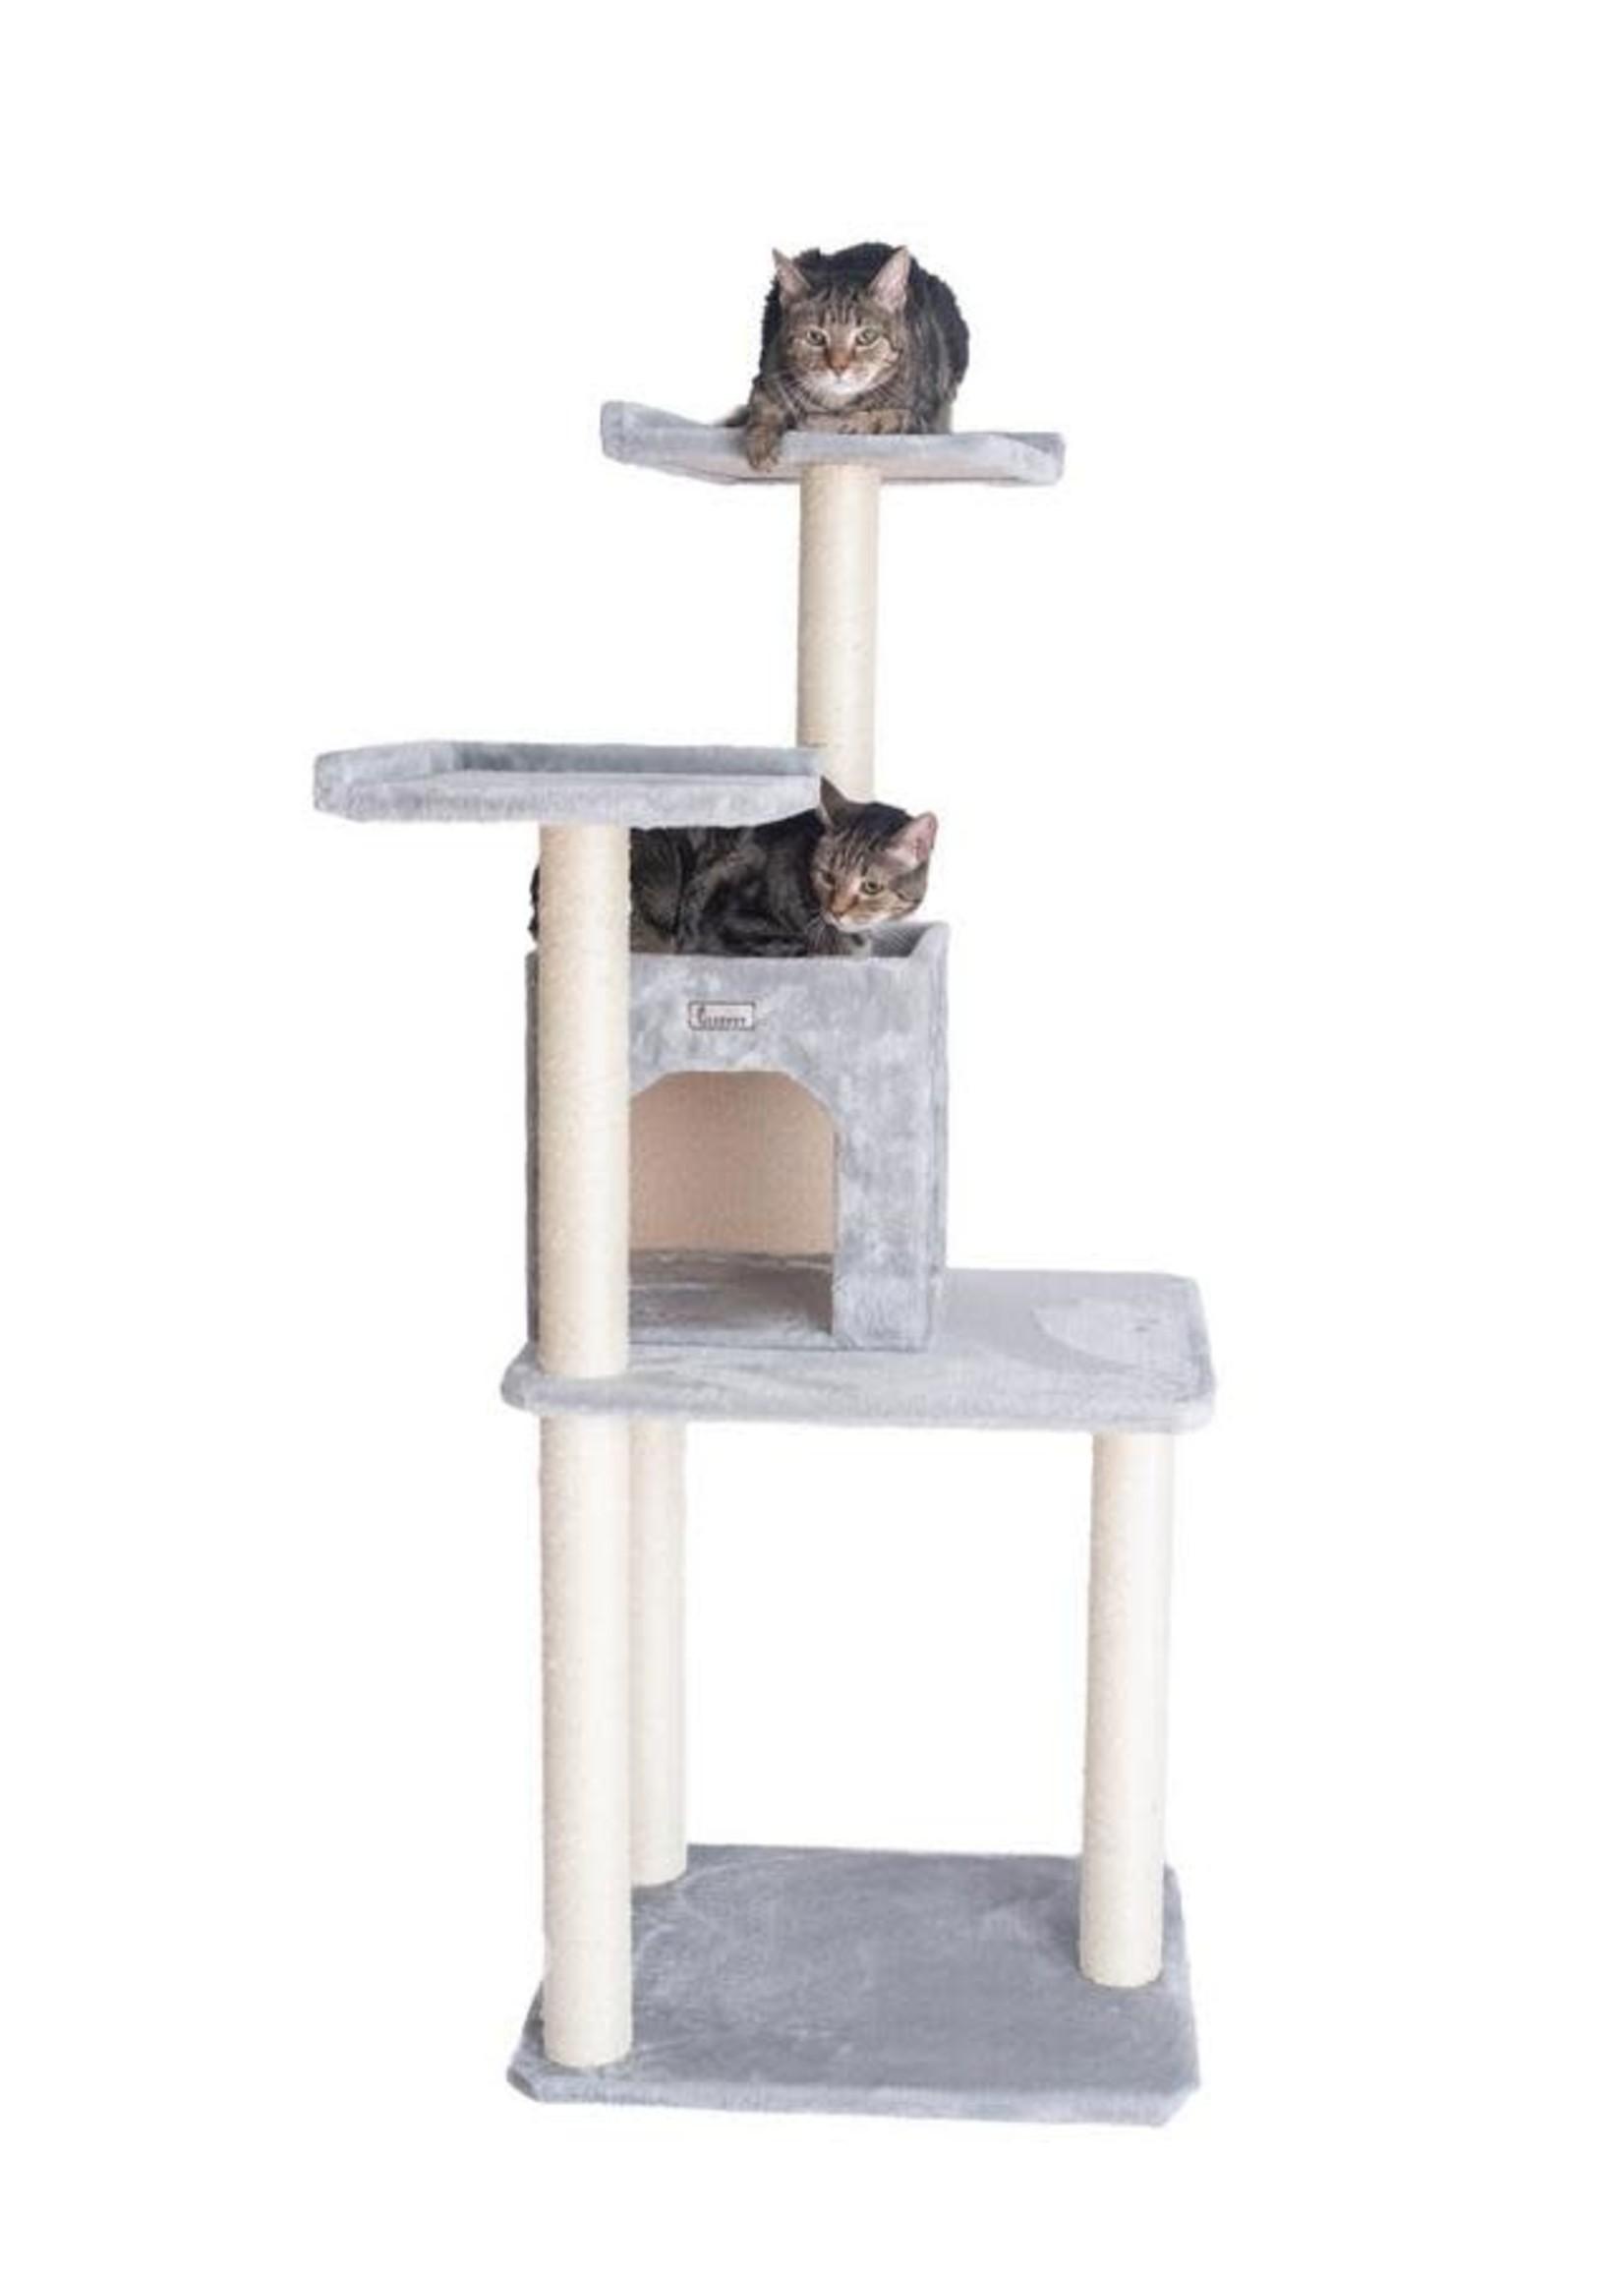 GleePet GleePet GP78571022 57-Inch Cat Tree In Silver Gray With Two-Door Condo